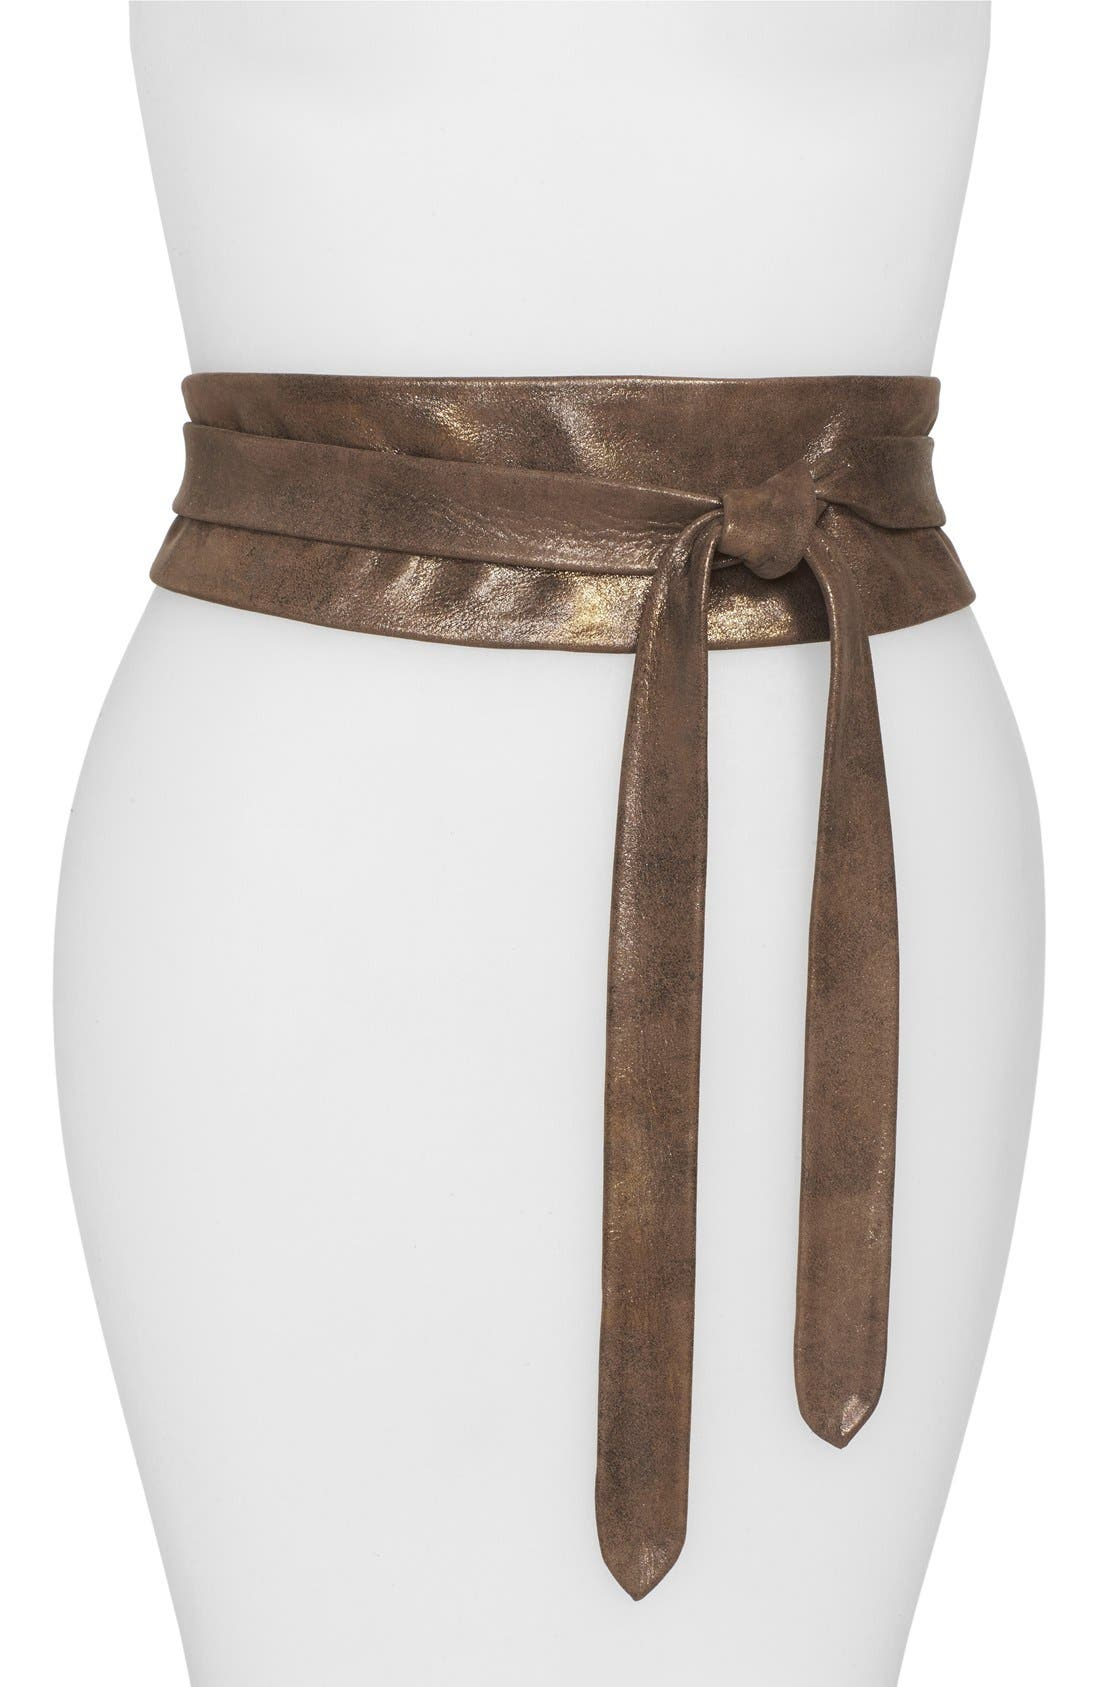 Main Image - Ada 'Obi' Leather Wrap Belt